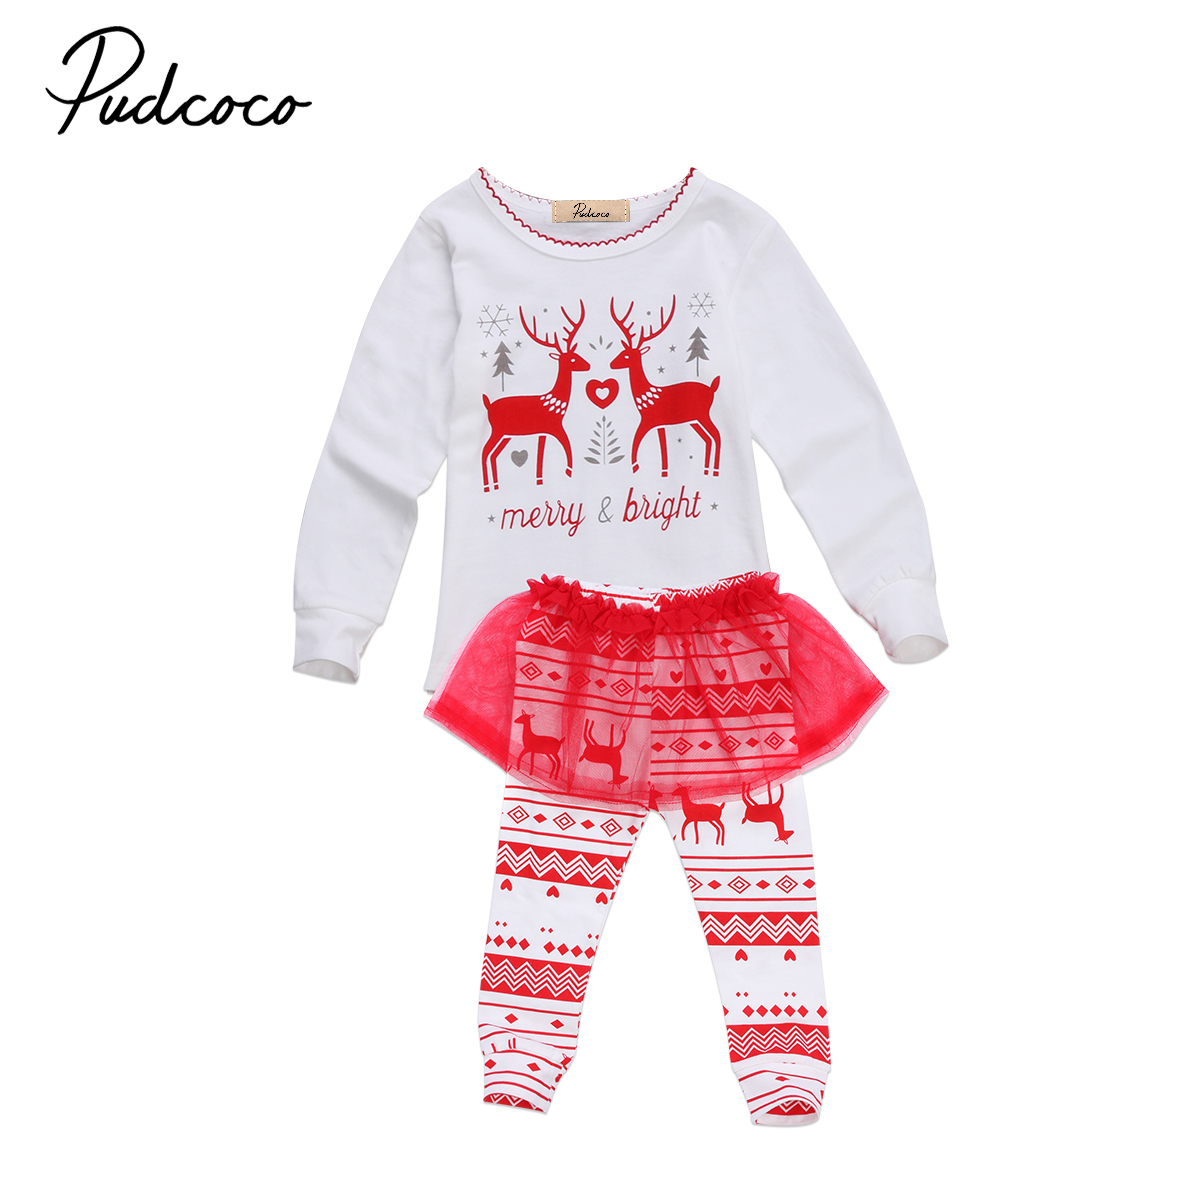 Toddler Kids Baby Girls Christmas Santa Pajamas Party Dress Xmas Playsuit Outfit Clothes